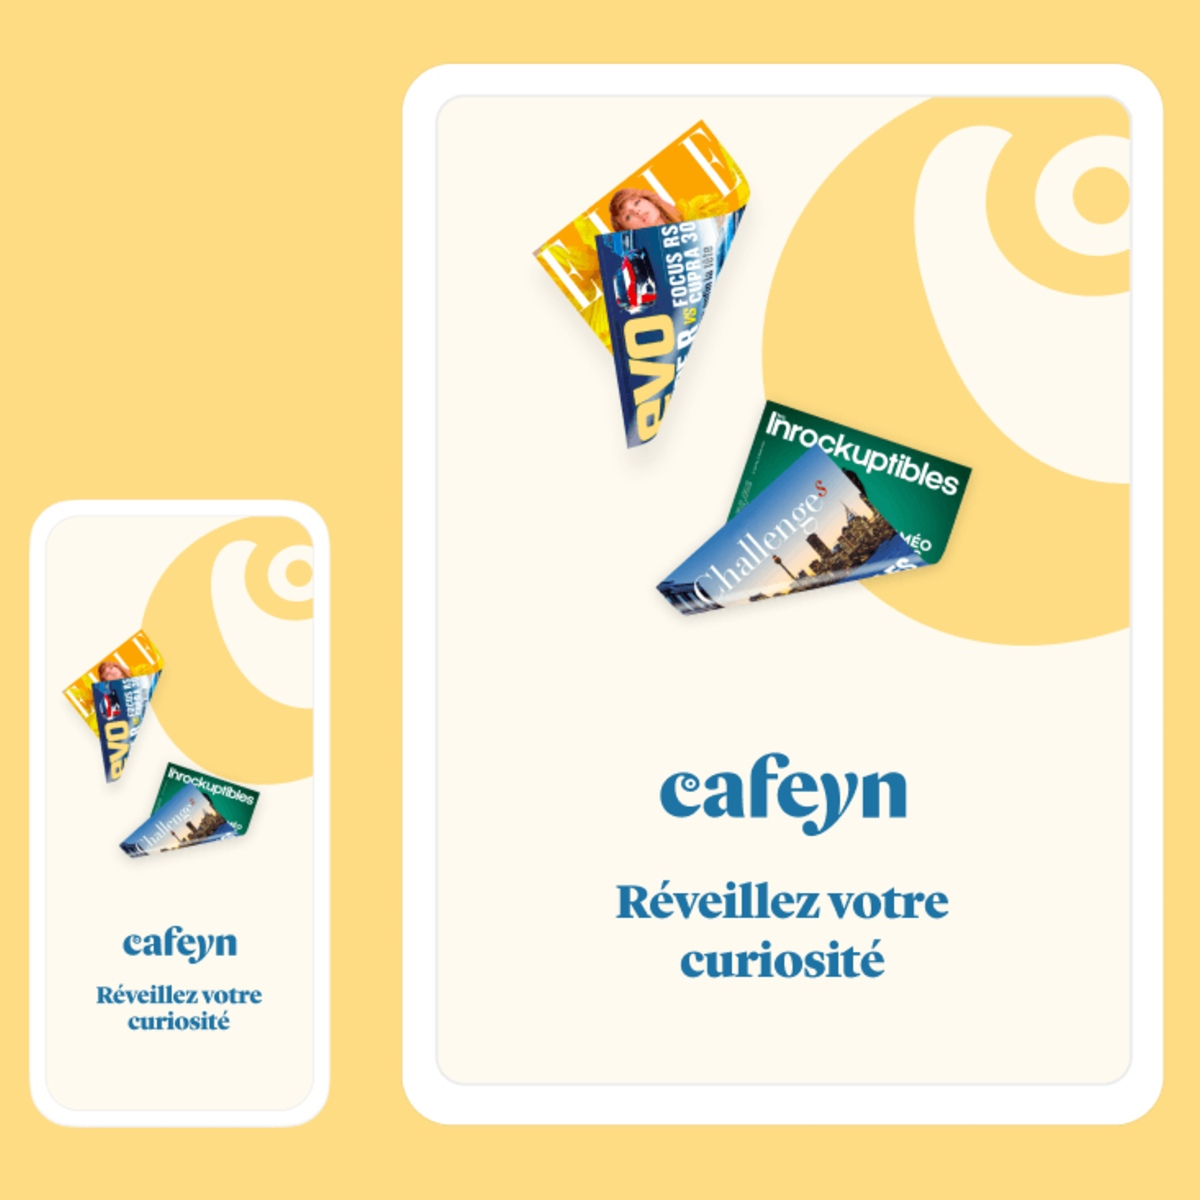 LeKiosk, premier service de streaming d'information en France, devient Cafeyn